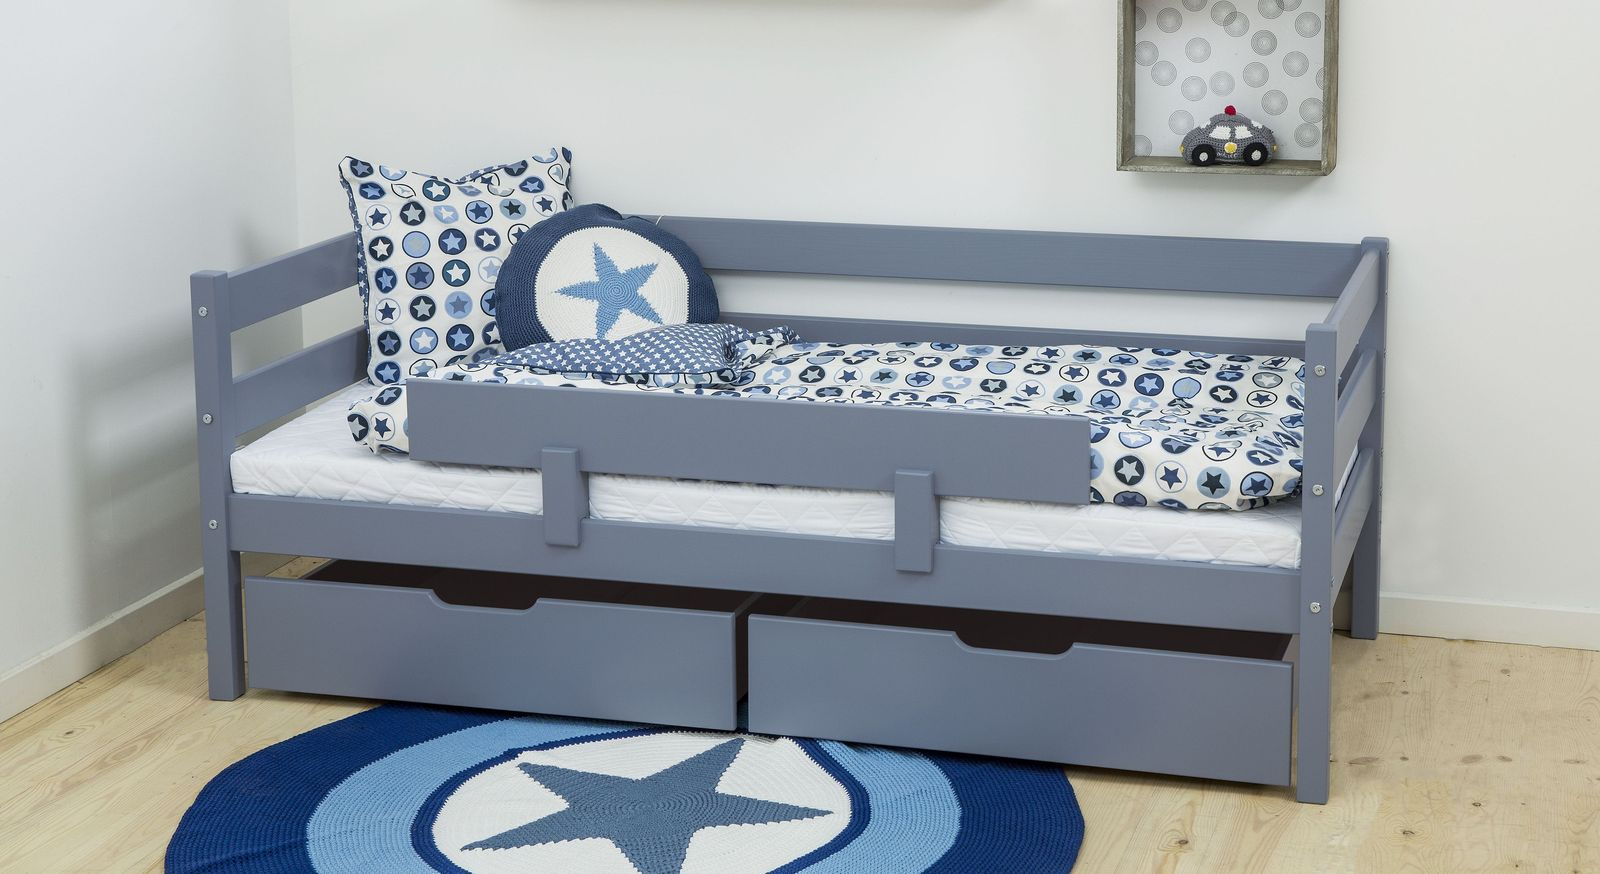 juniorbett 70x160 aus massiver kiefer z b in blau kids heaven. Black Bedroom Furniture Sets. Home Design Ideas